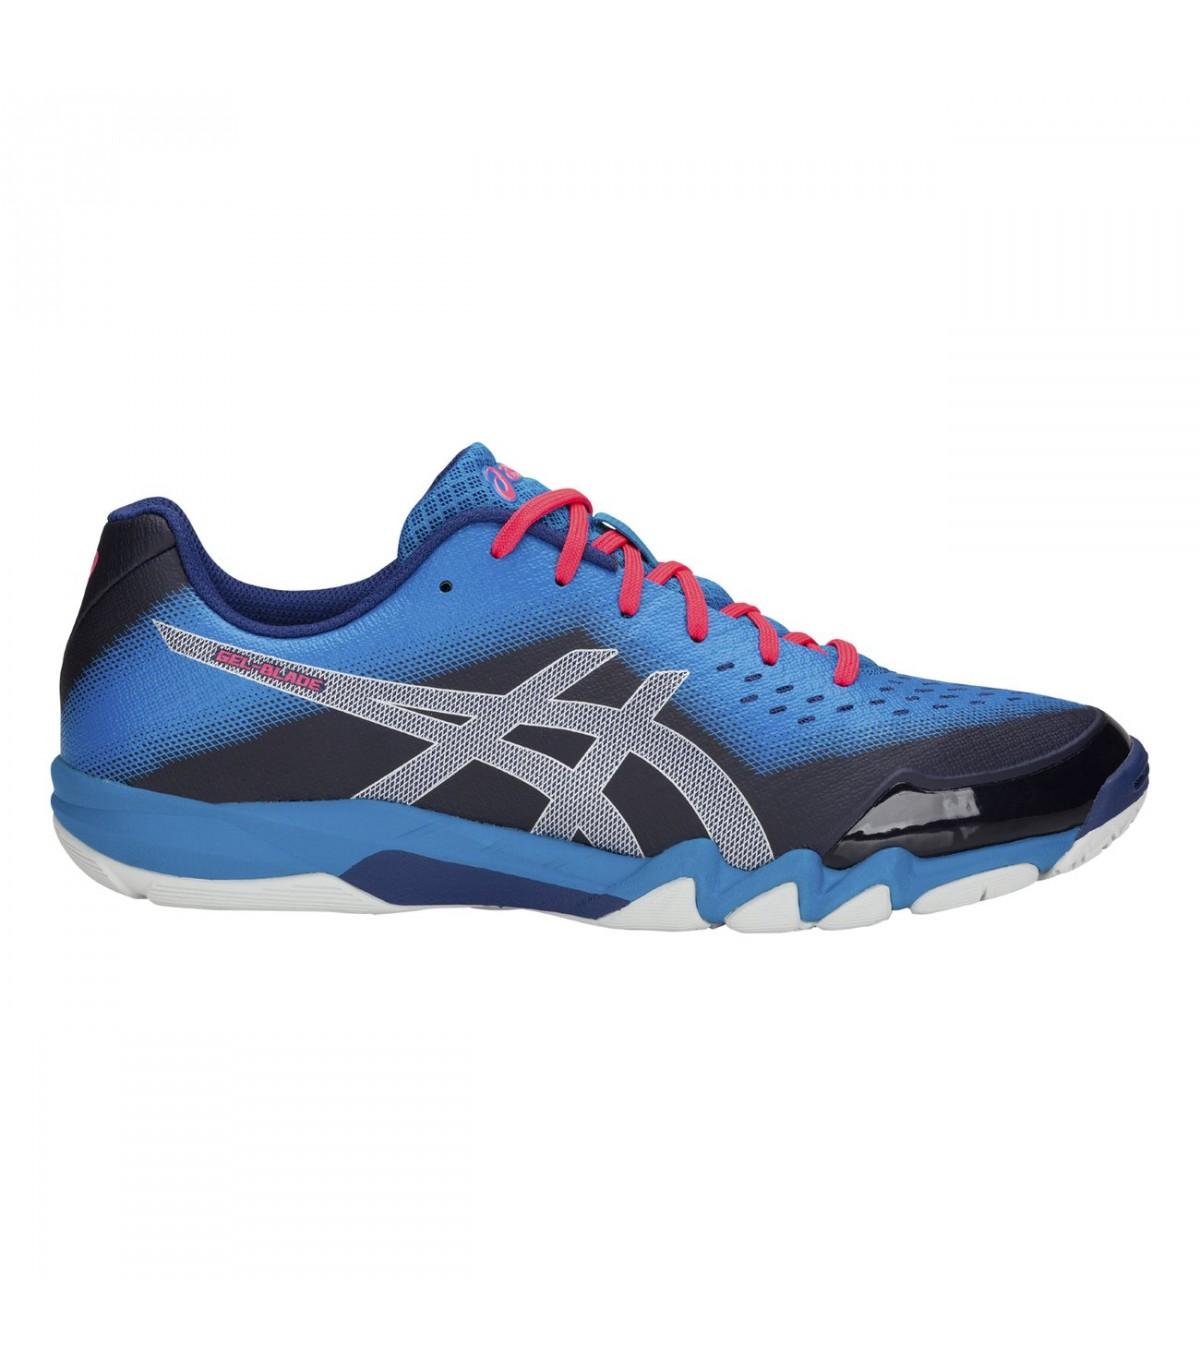 Asics Gel-Blade 6 Squash shoes